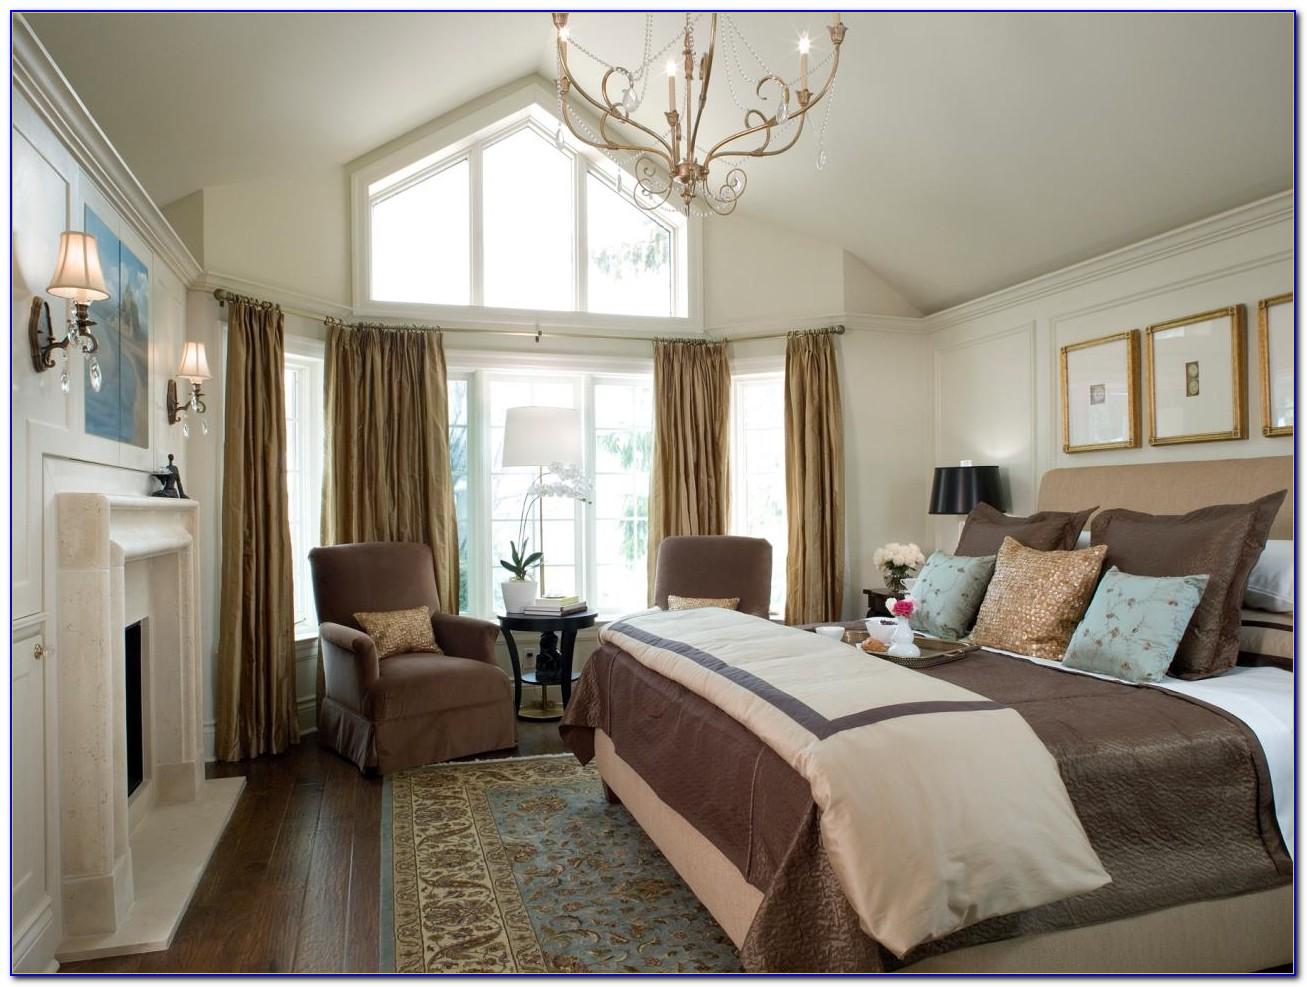 Bedding Ideas For Master Bedroom